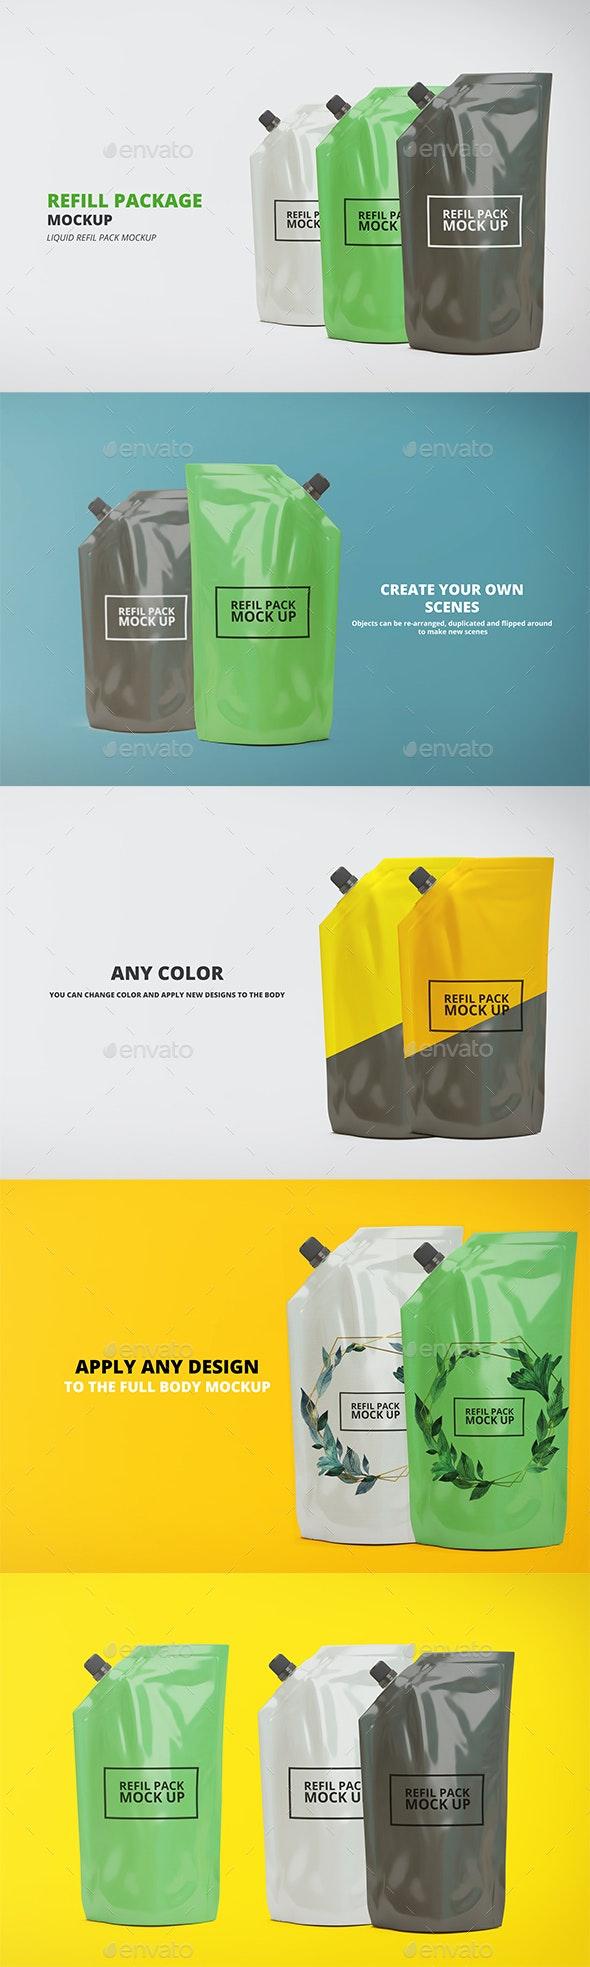 Refill Package - Beauty Packaging